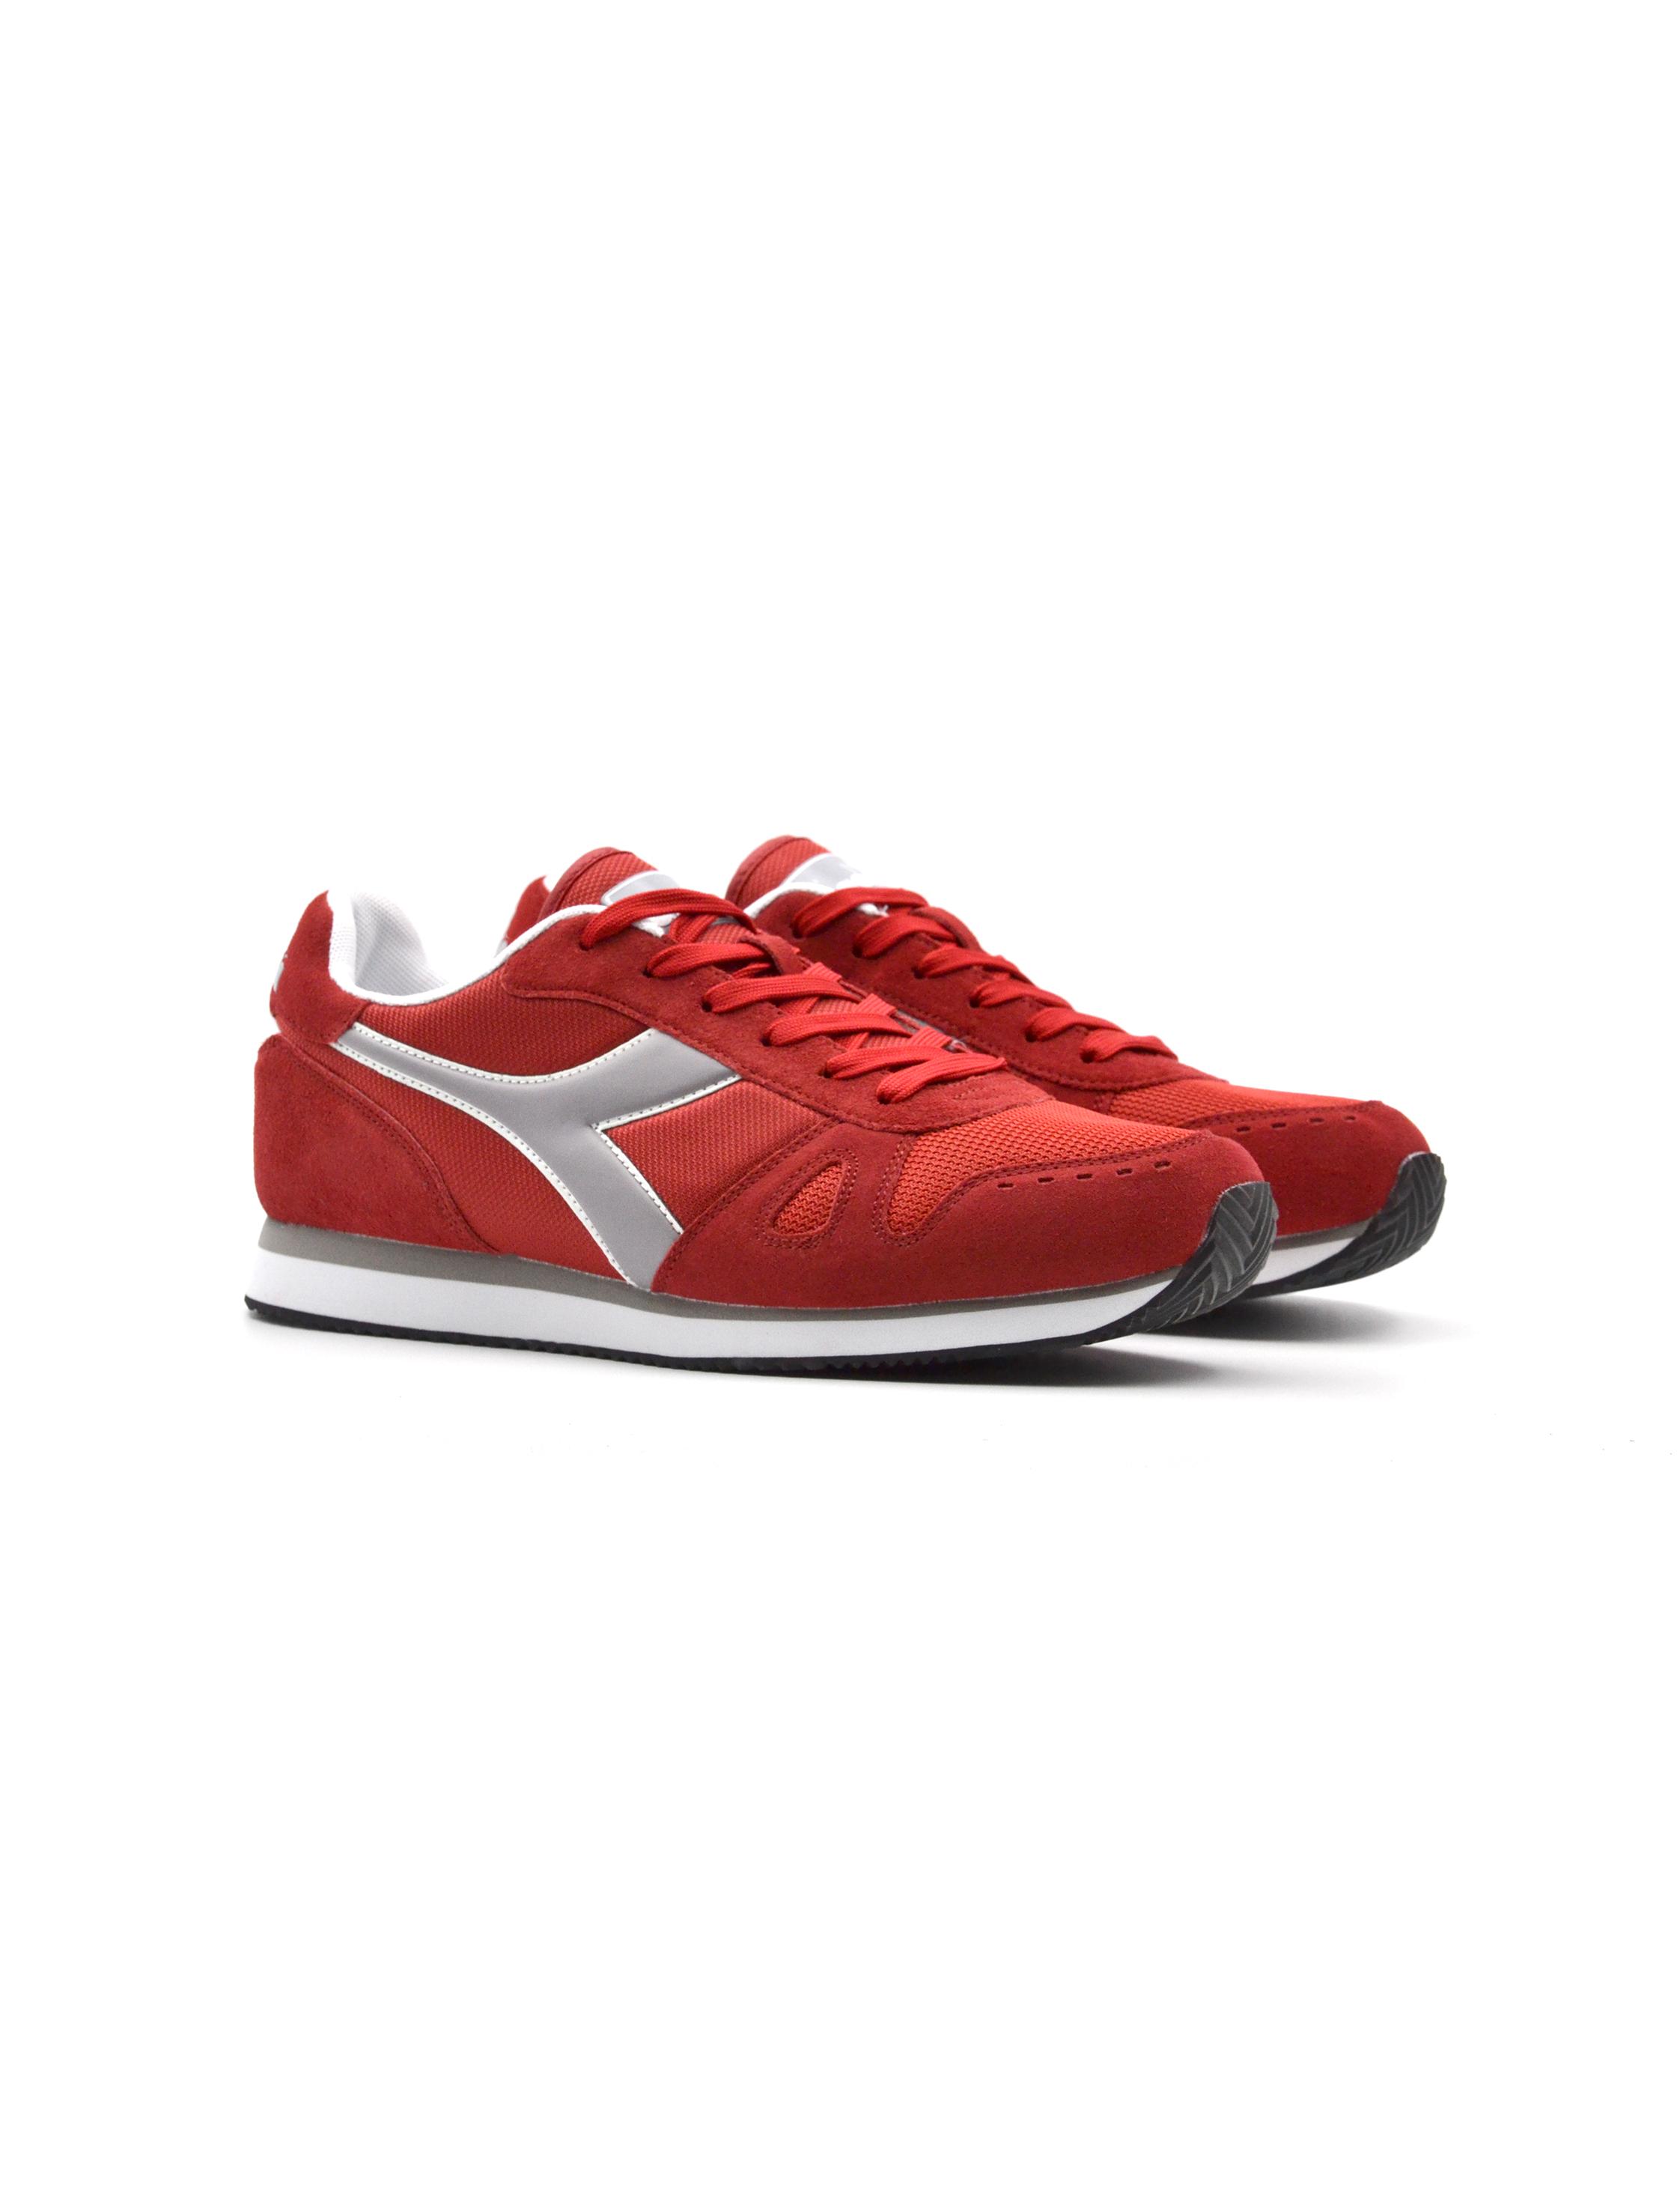 Diadora simple run sneaker uomo, Sneakers brand, colore